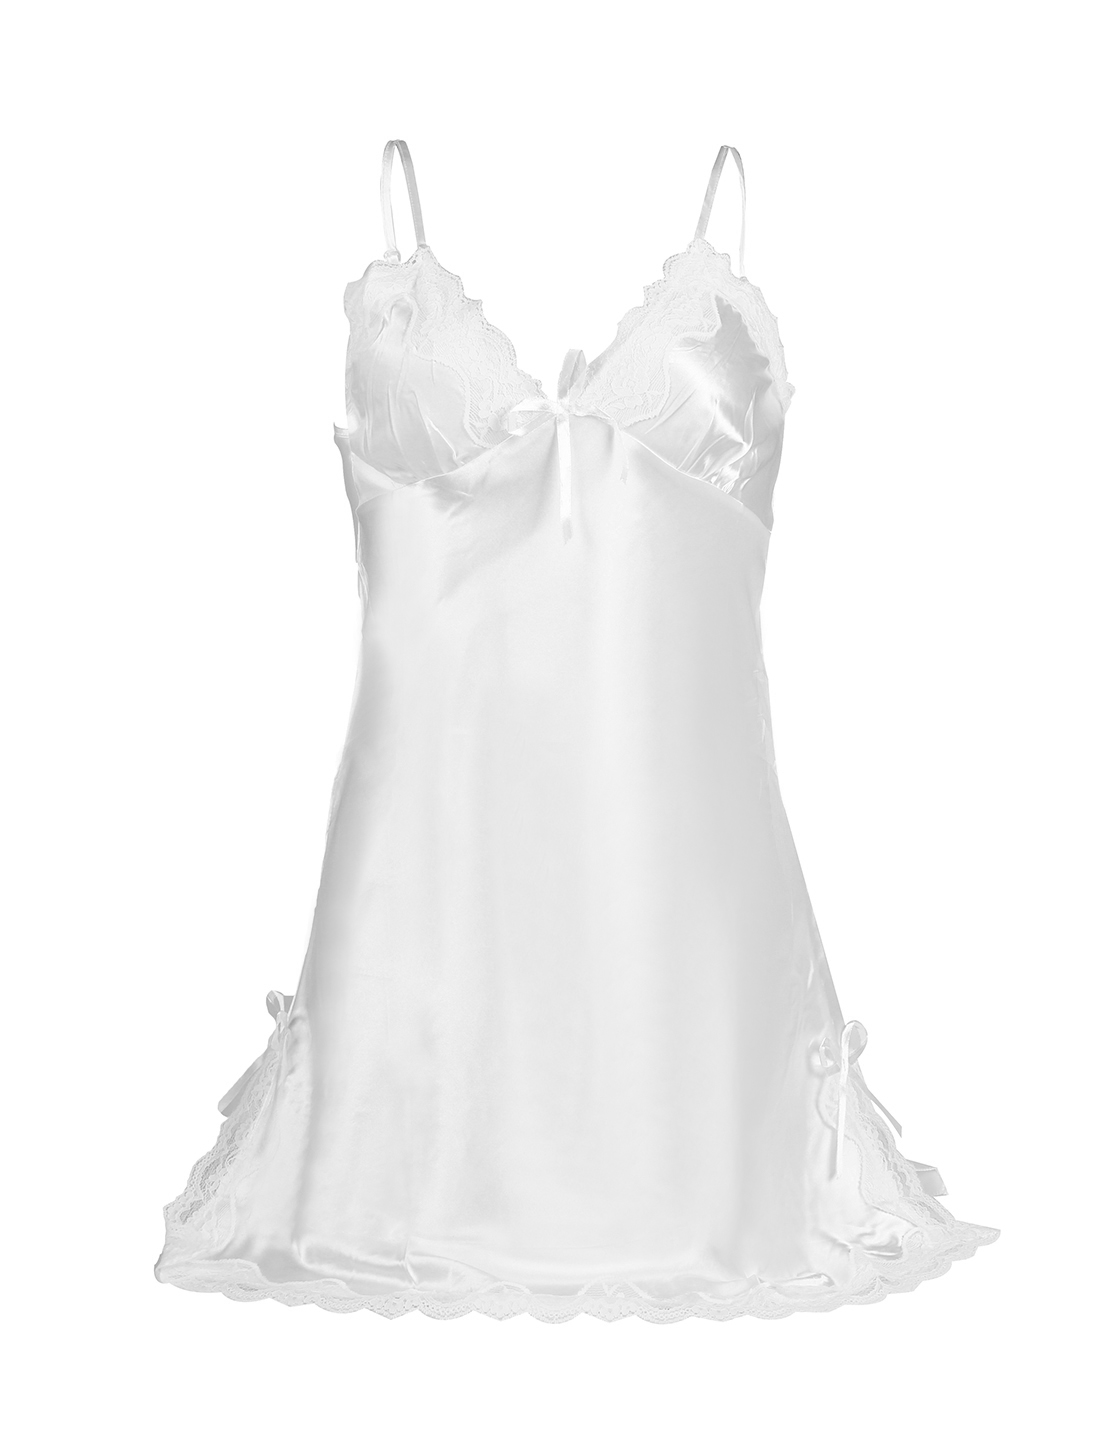 Women Sexy Satin Lace Trim Sleepwear Nightgown Pajama Slip Dress White-Lace L